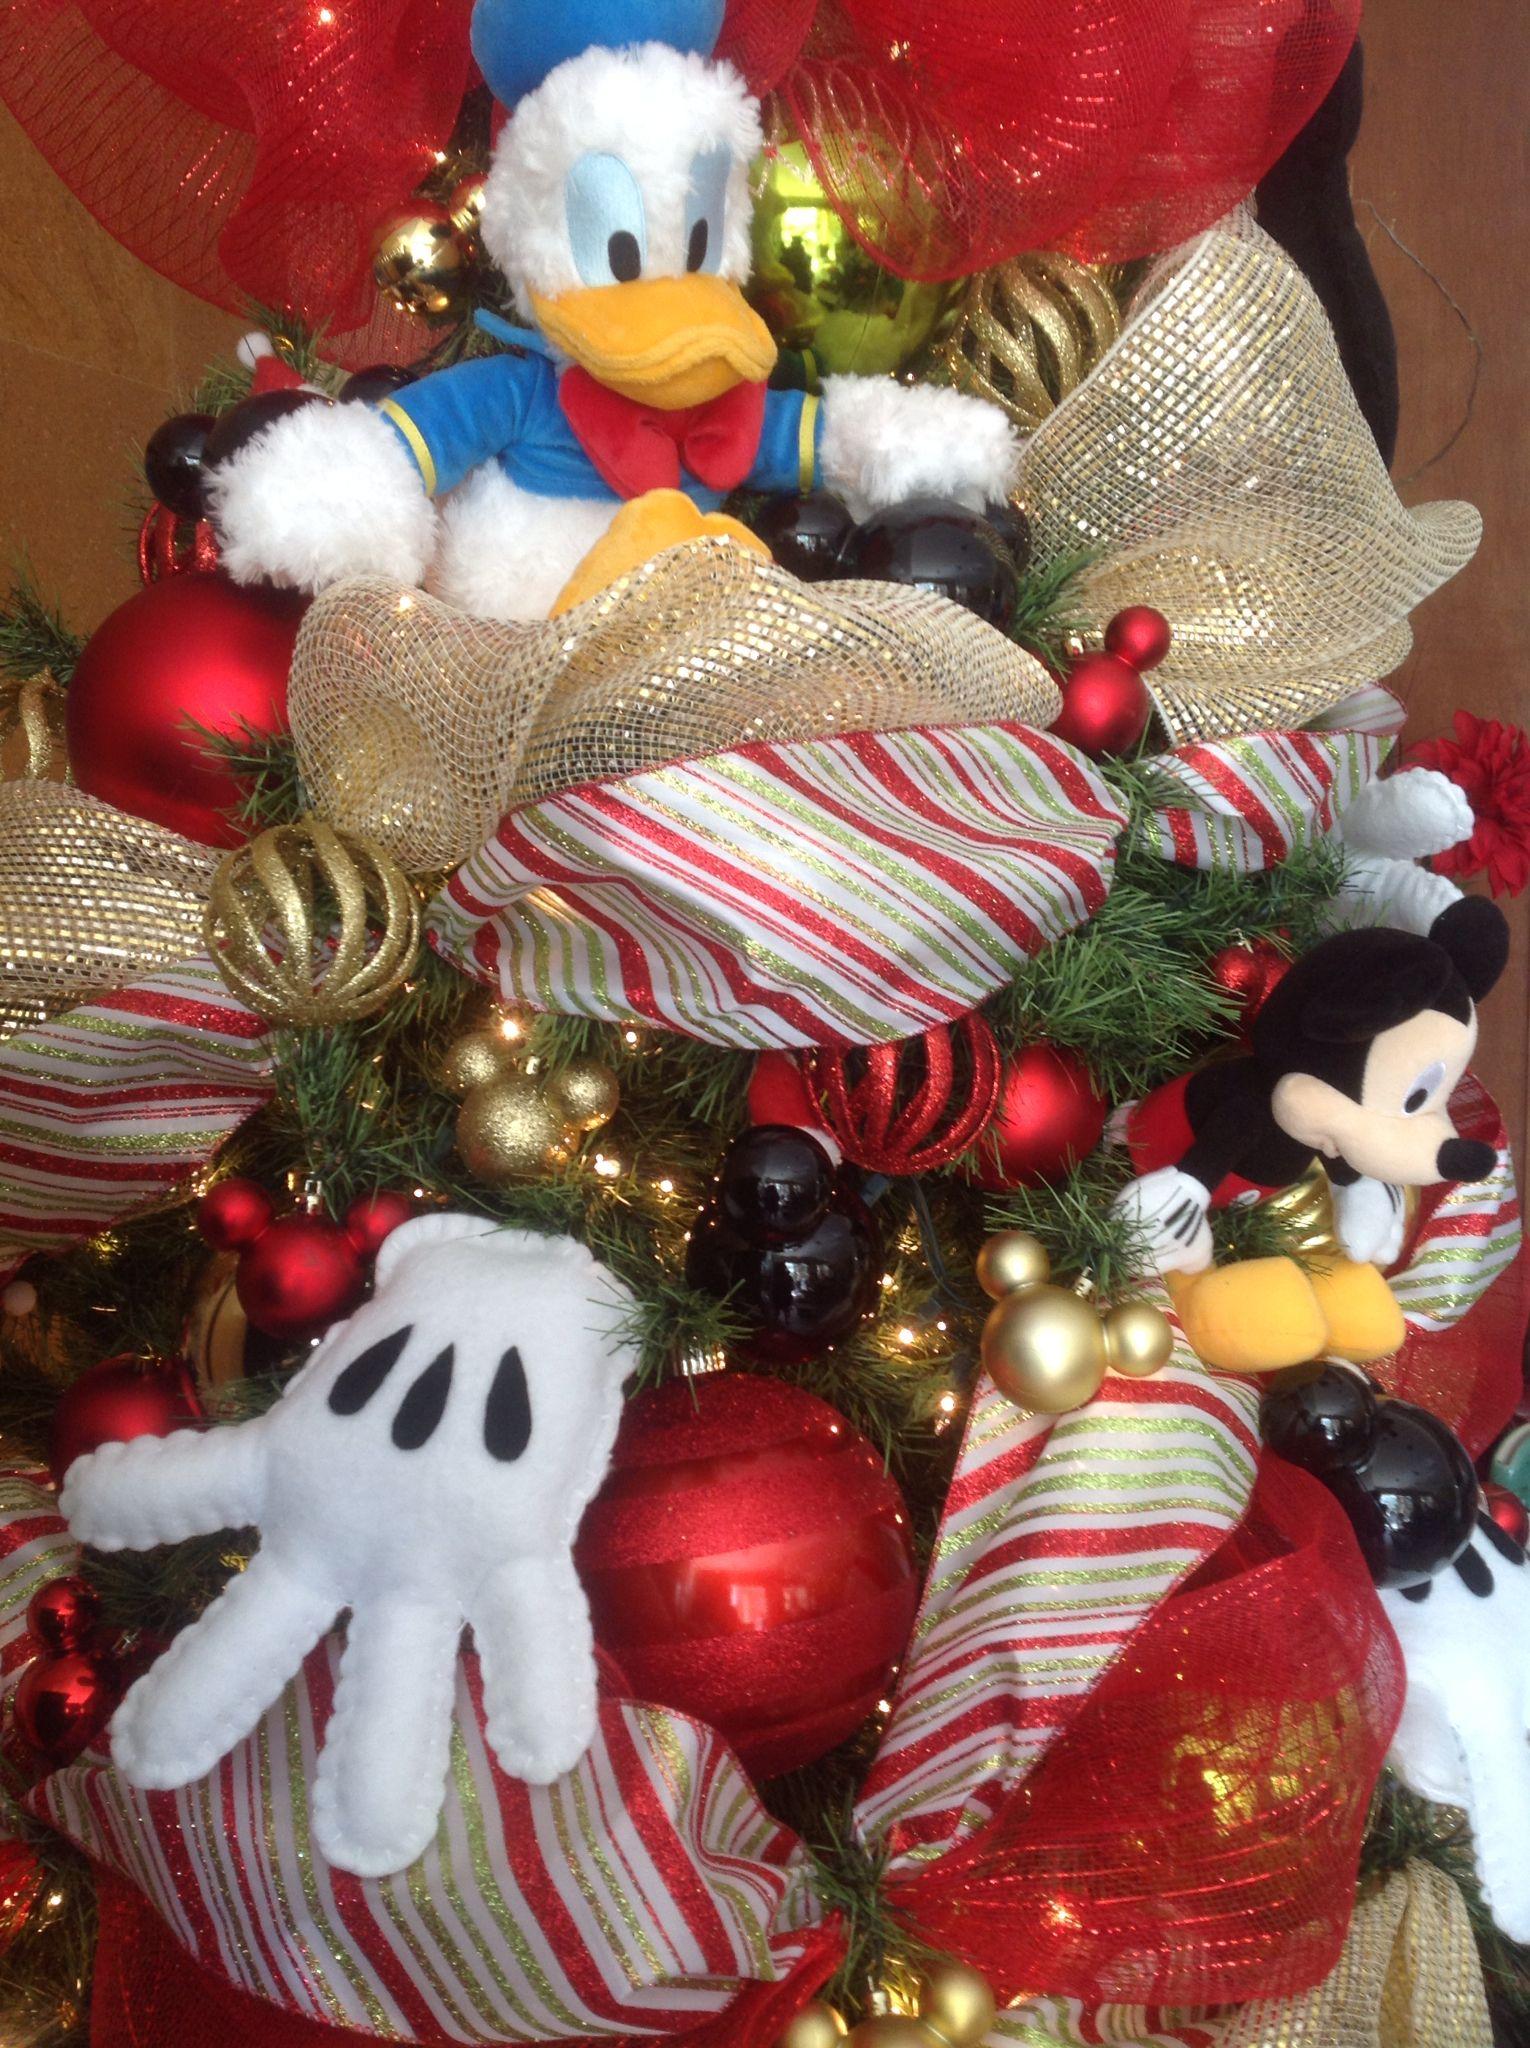 Mickey mouse rbol navidad arbol de navidad for Adornos navidenos mickey mouse